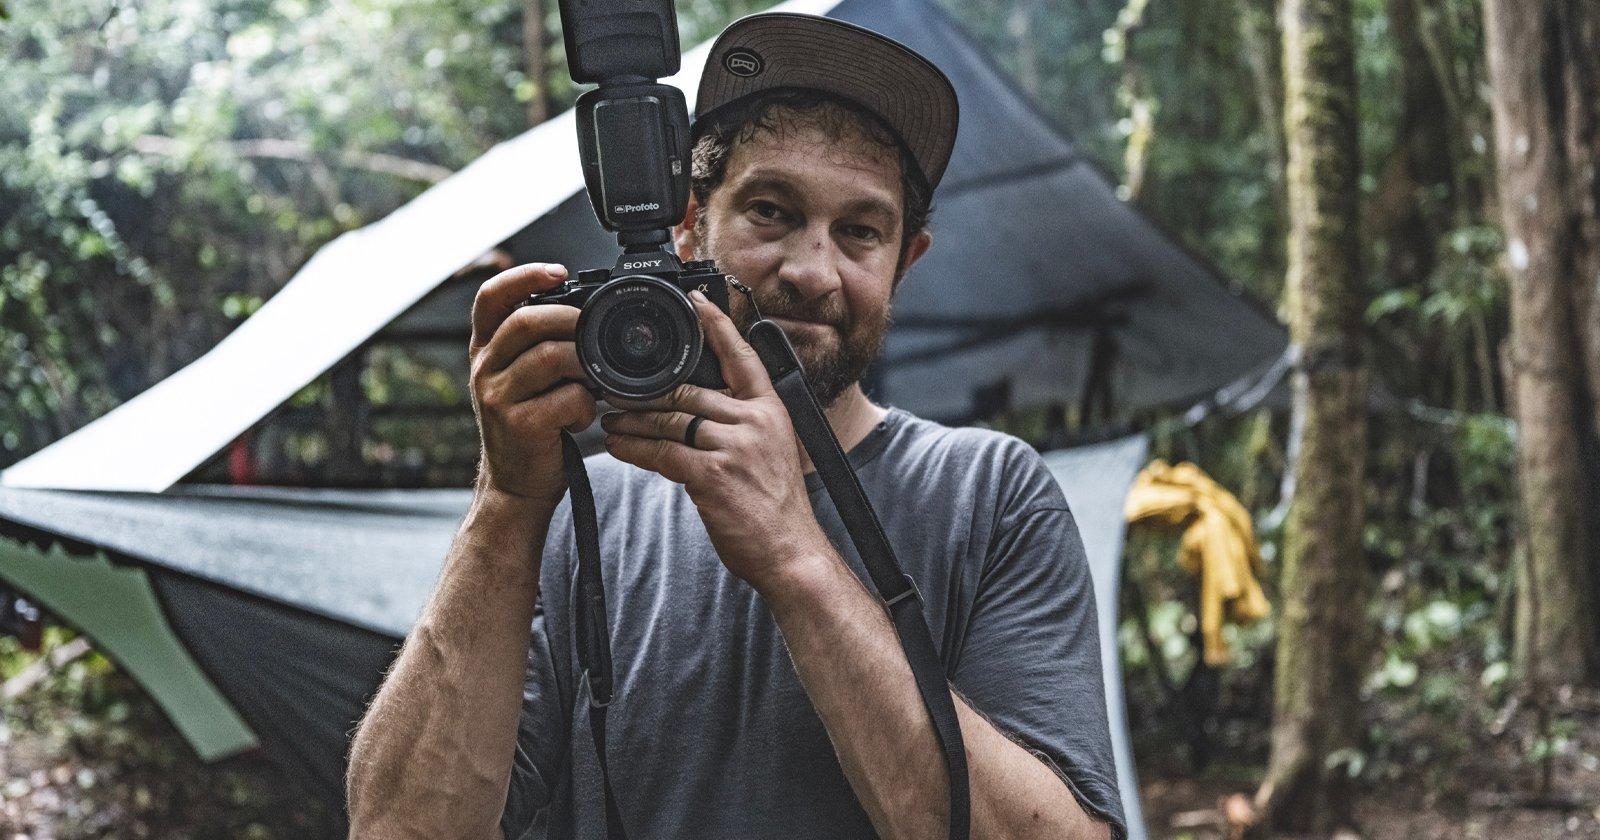 Nat Geo Photographer 'Battle Test' Sony Alpha 1 in Sud America